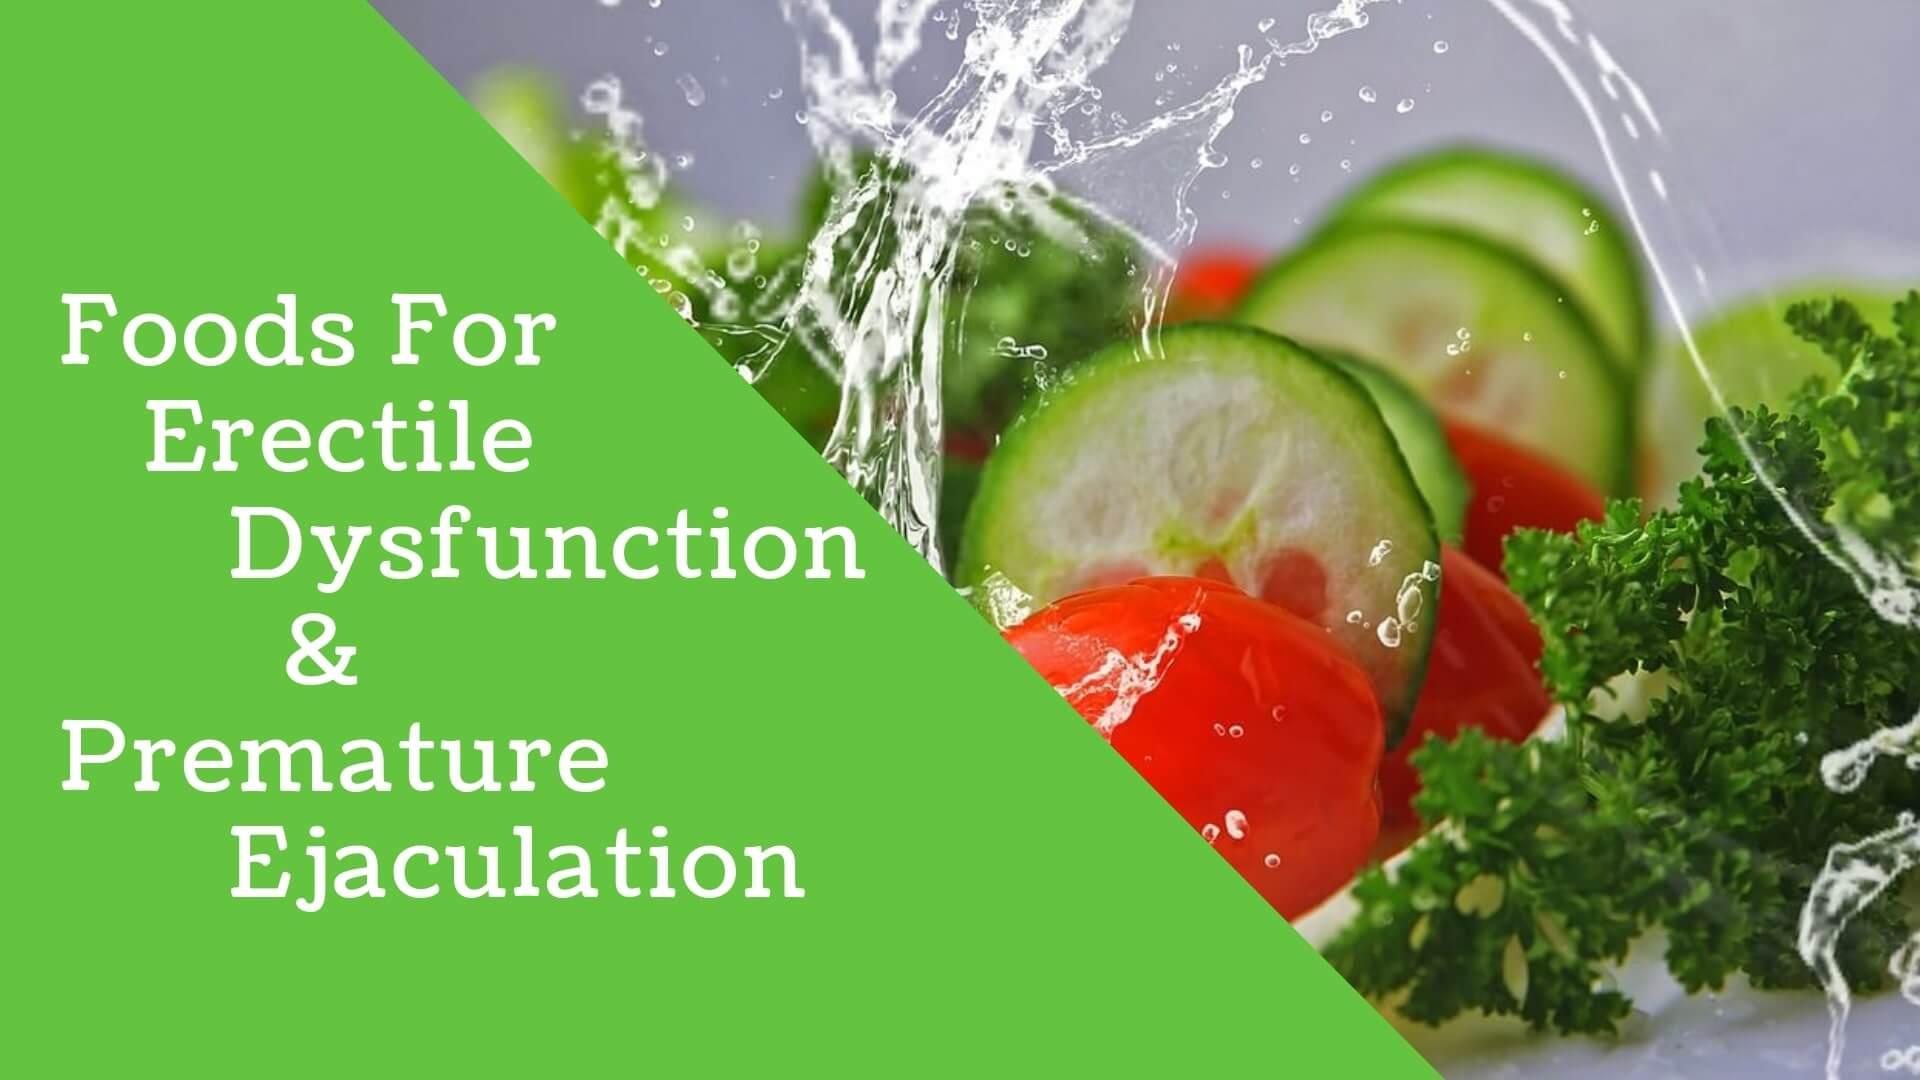 Foods for Erectile Dysfunction and Premature Ejaculation